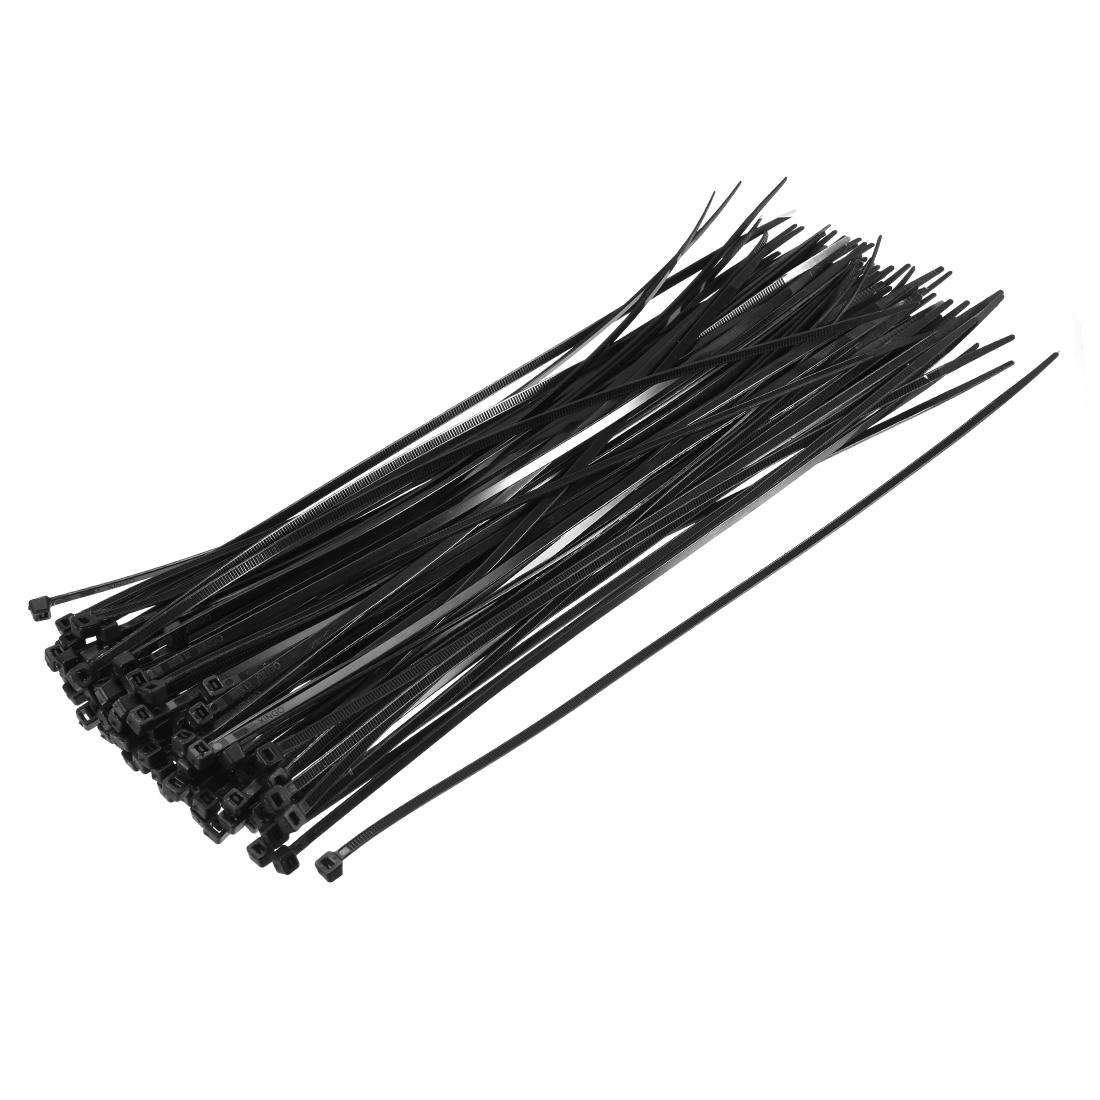 Cable Zip Ties 250mmx3.6mm Self-Locking Nylon Tie Wraps Black 100pcs